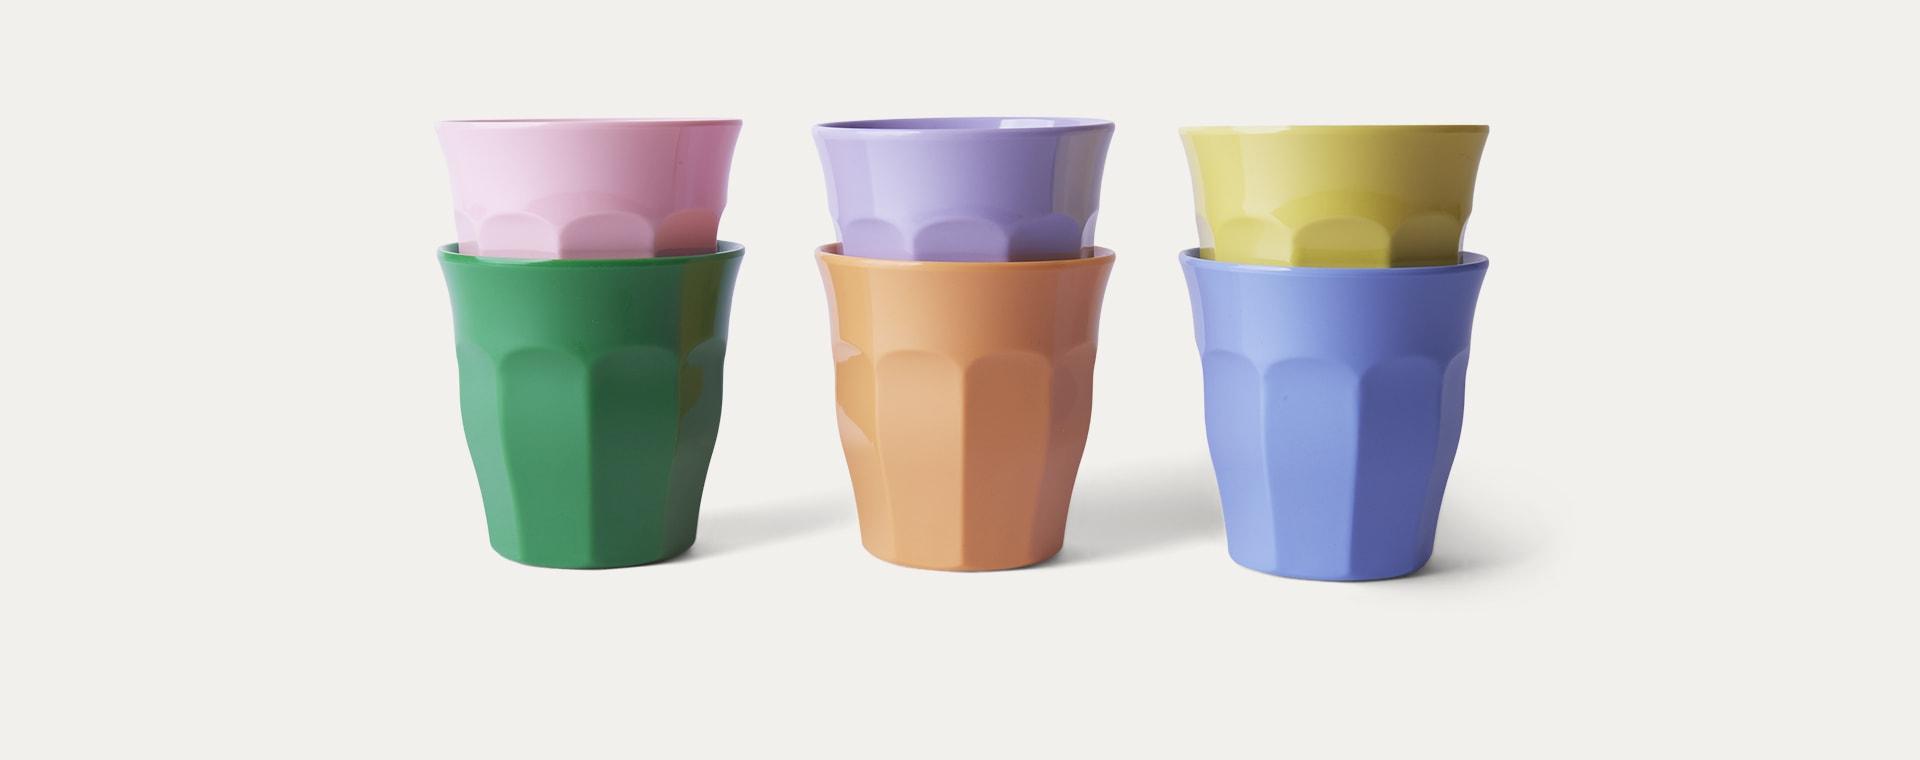 Summer Pastels Rice Melamine Cups 6 Pack